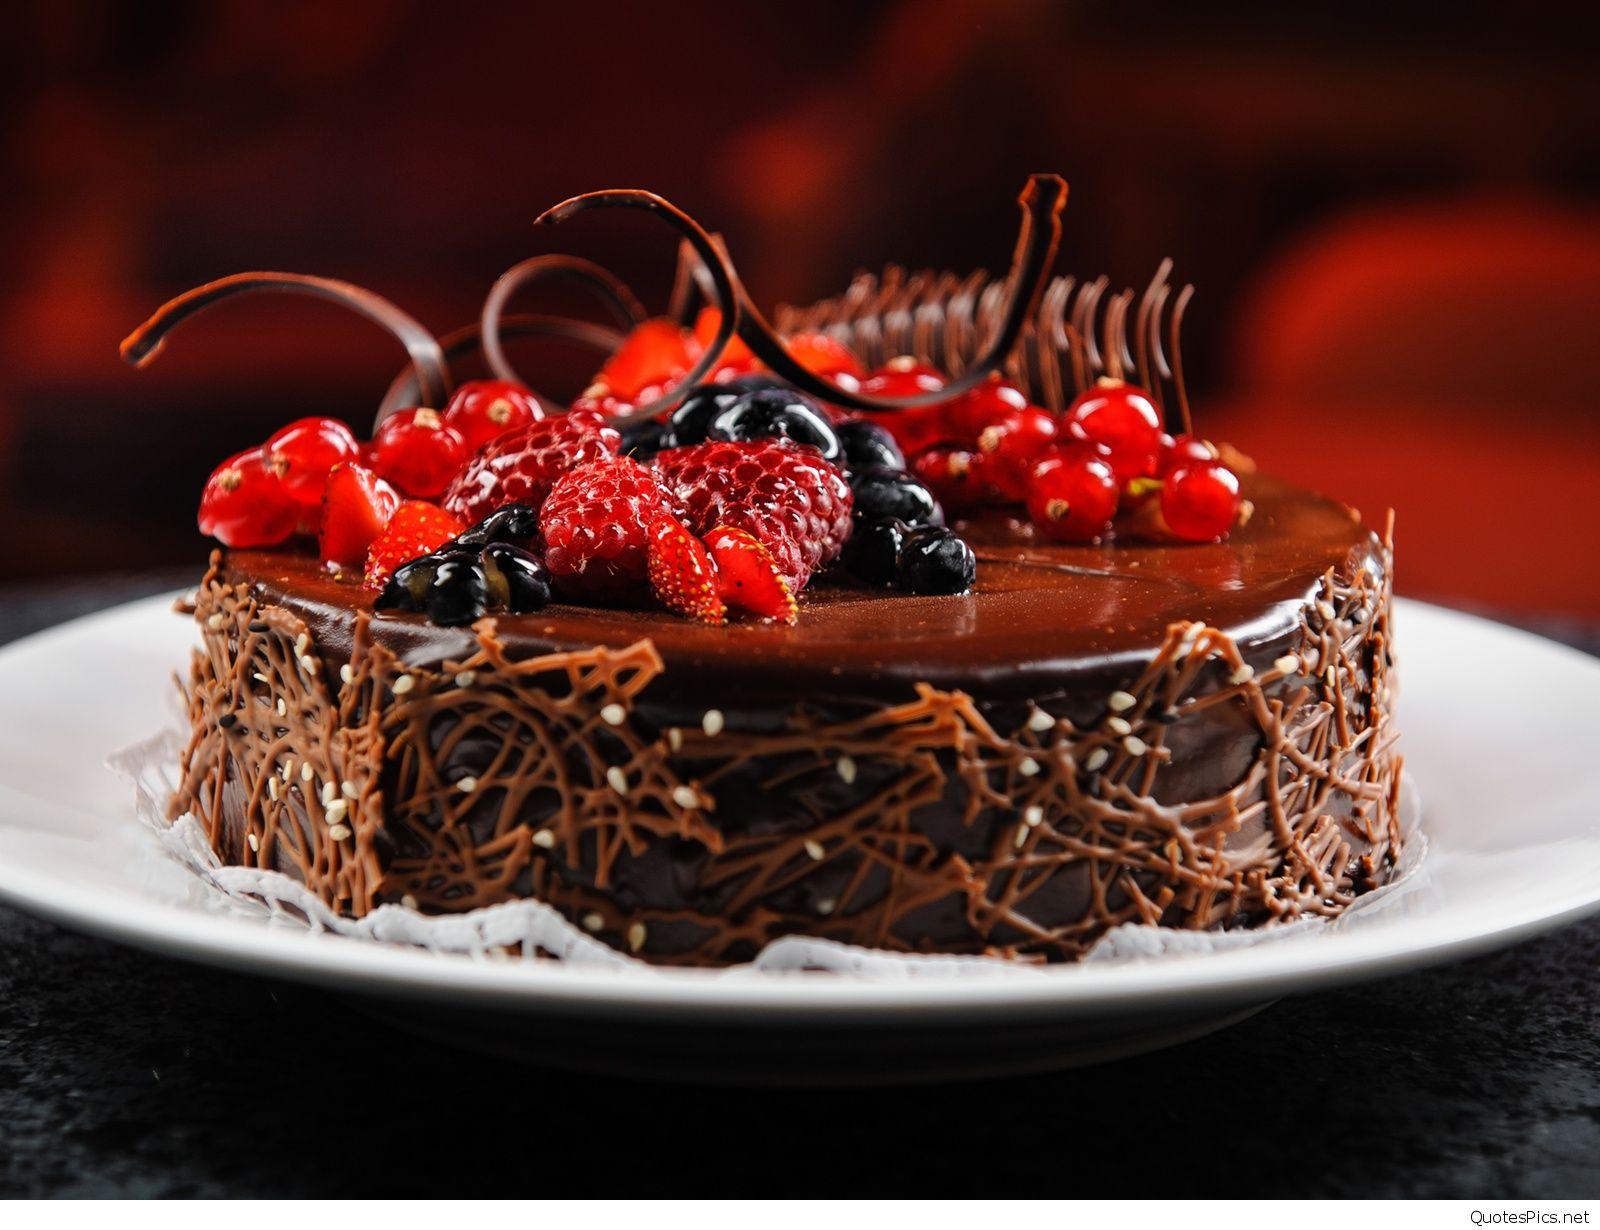 Write Name On Th Birthday Cake Happy Birthday Cake Images 1600x1230